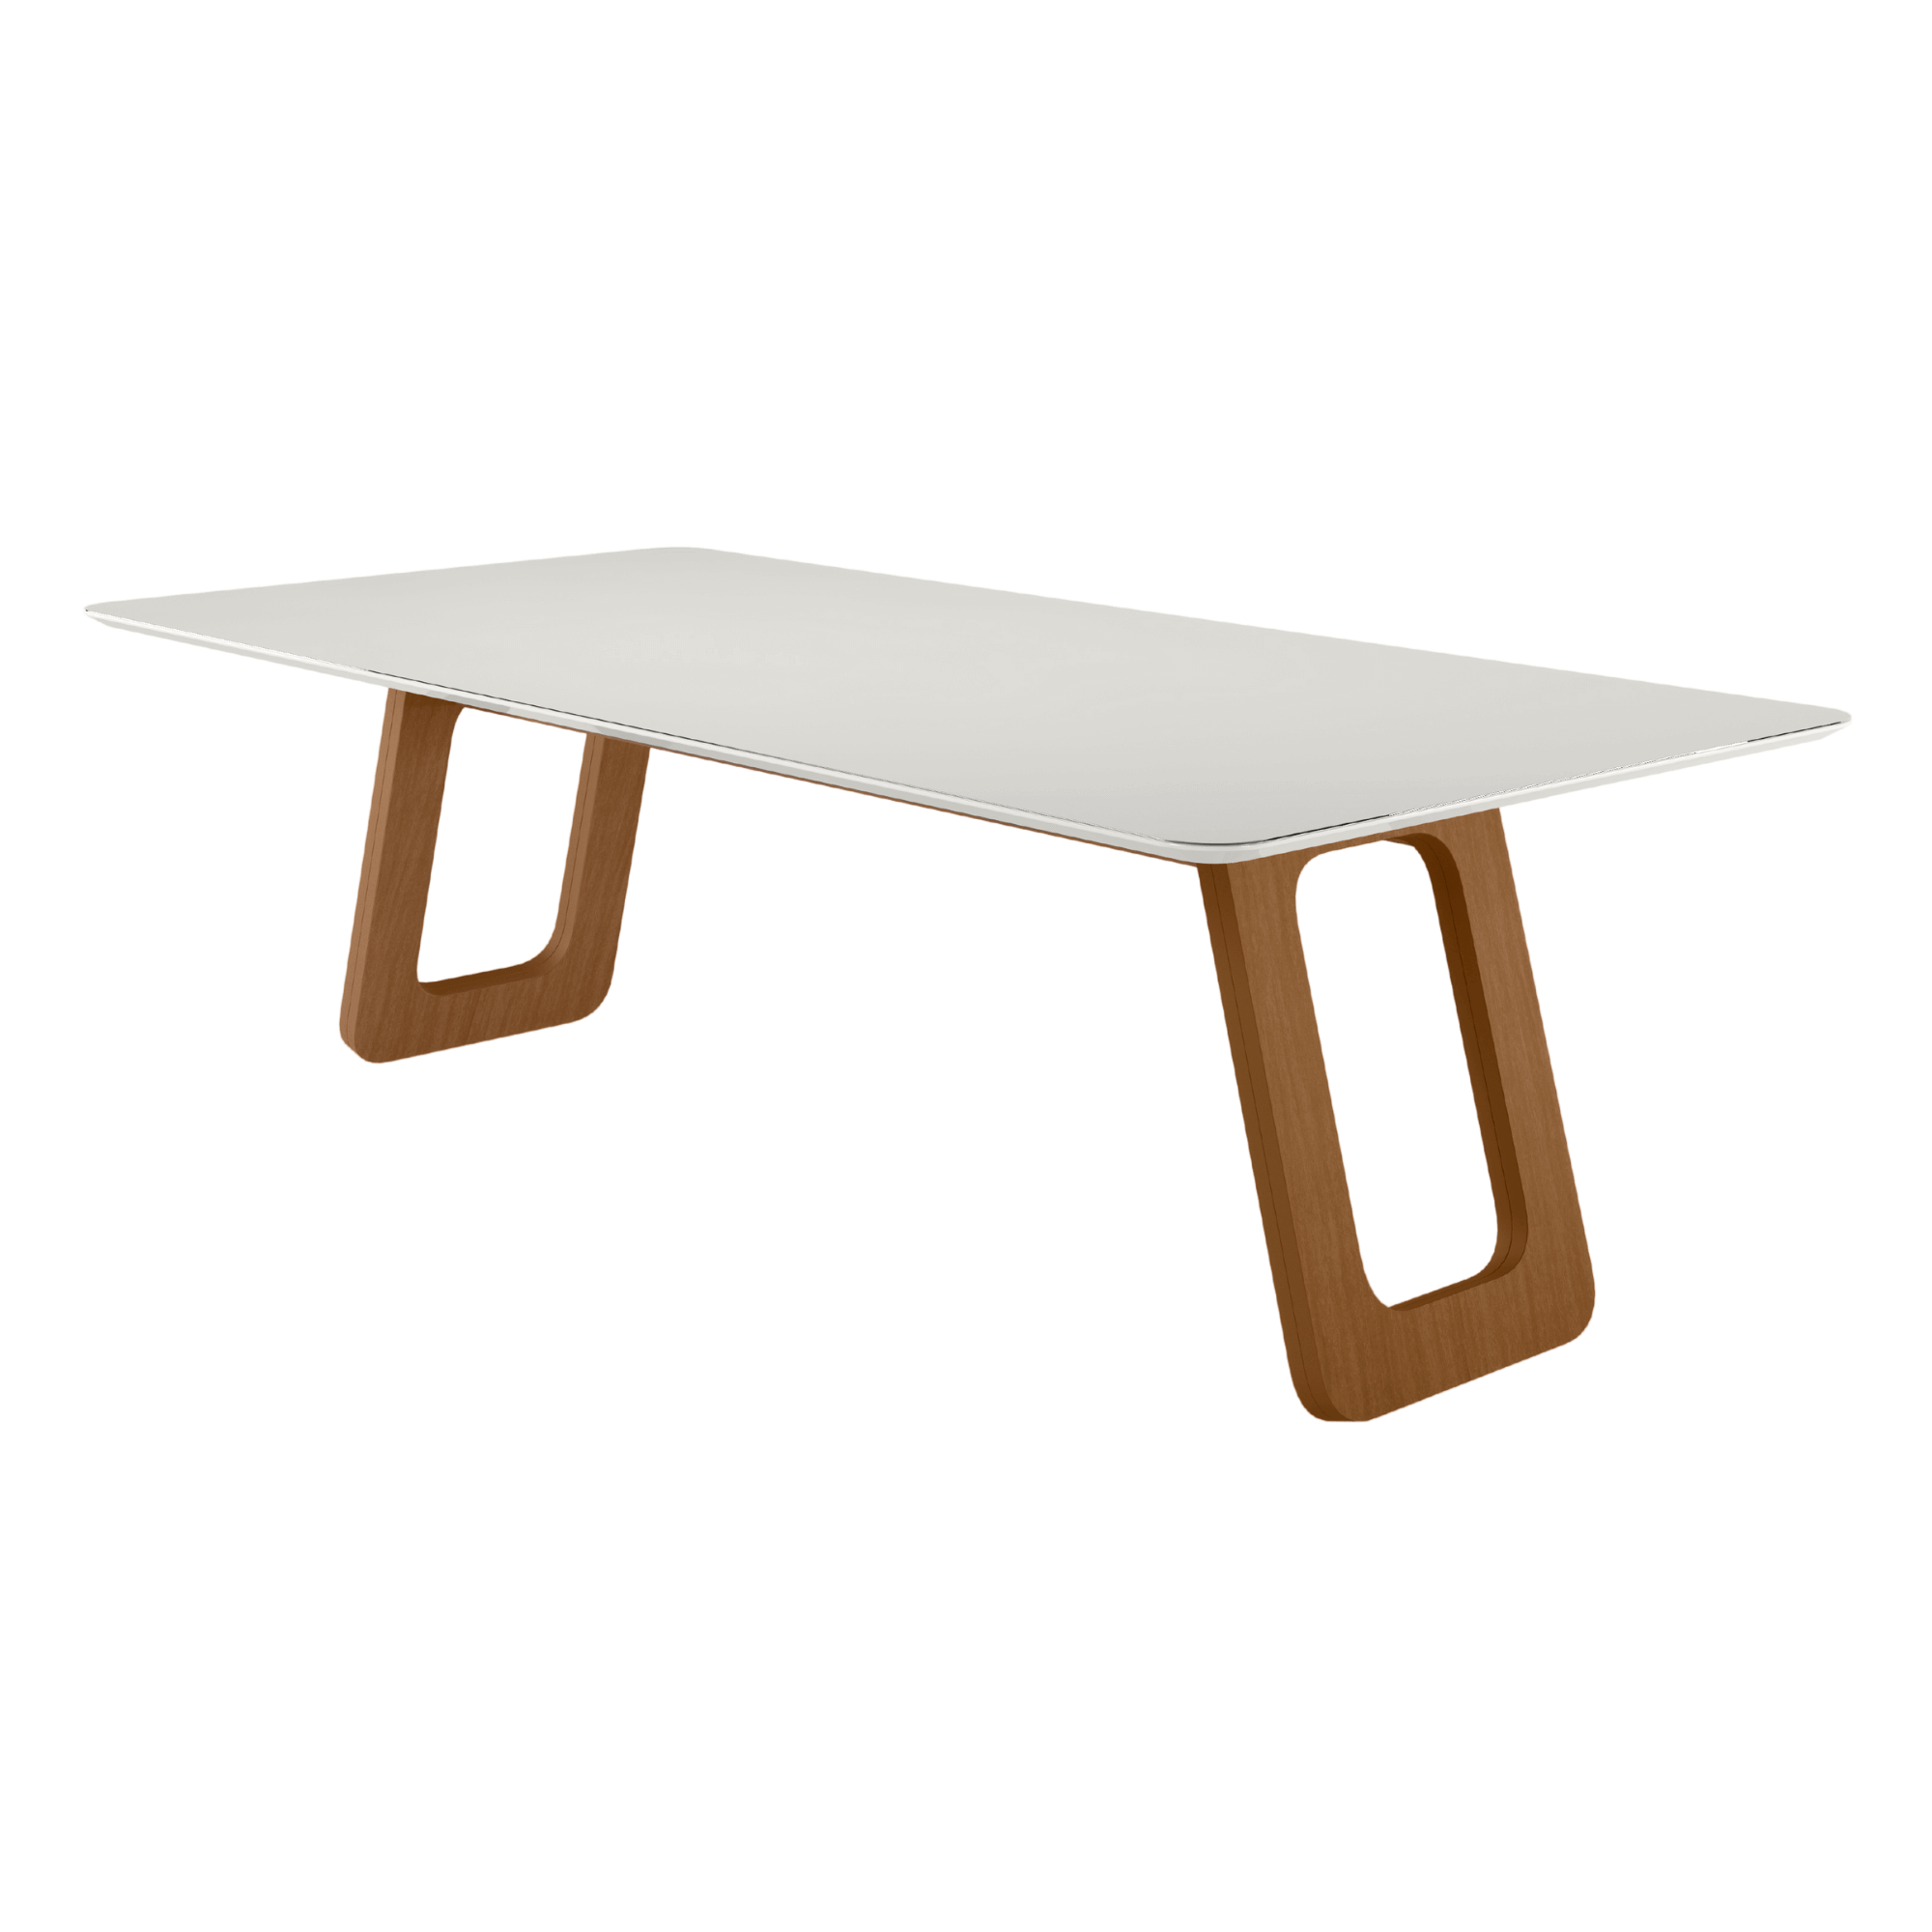 Mesa de Jantar 8 Lugares Retangular Oslo 218 cm x 110 cm